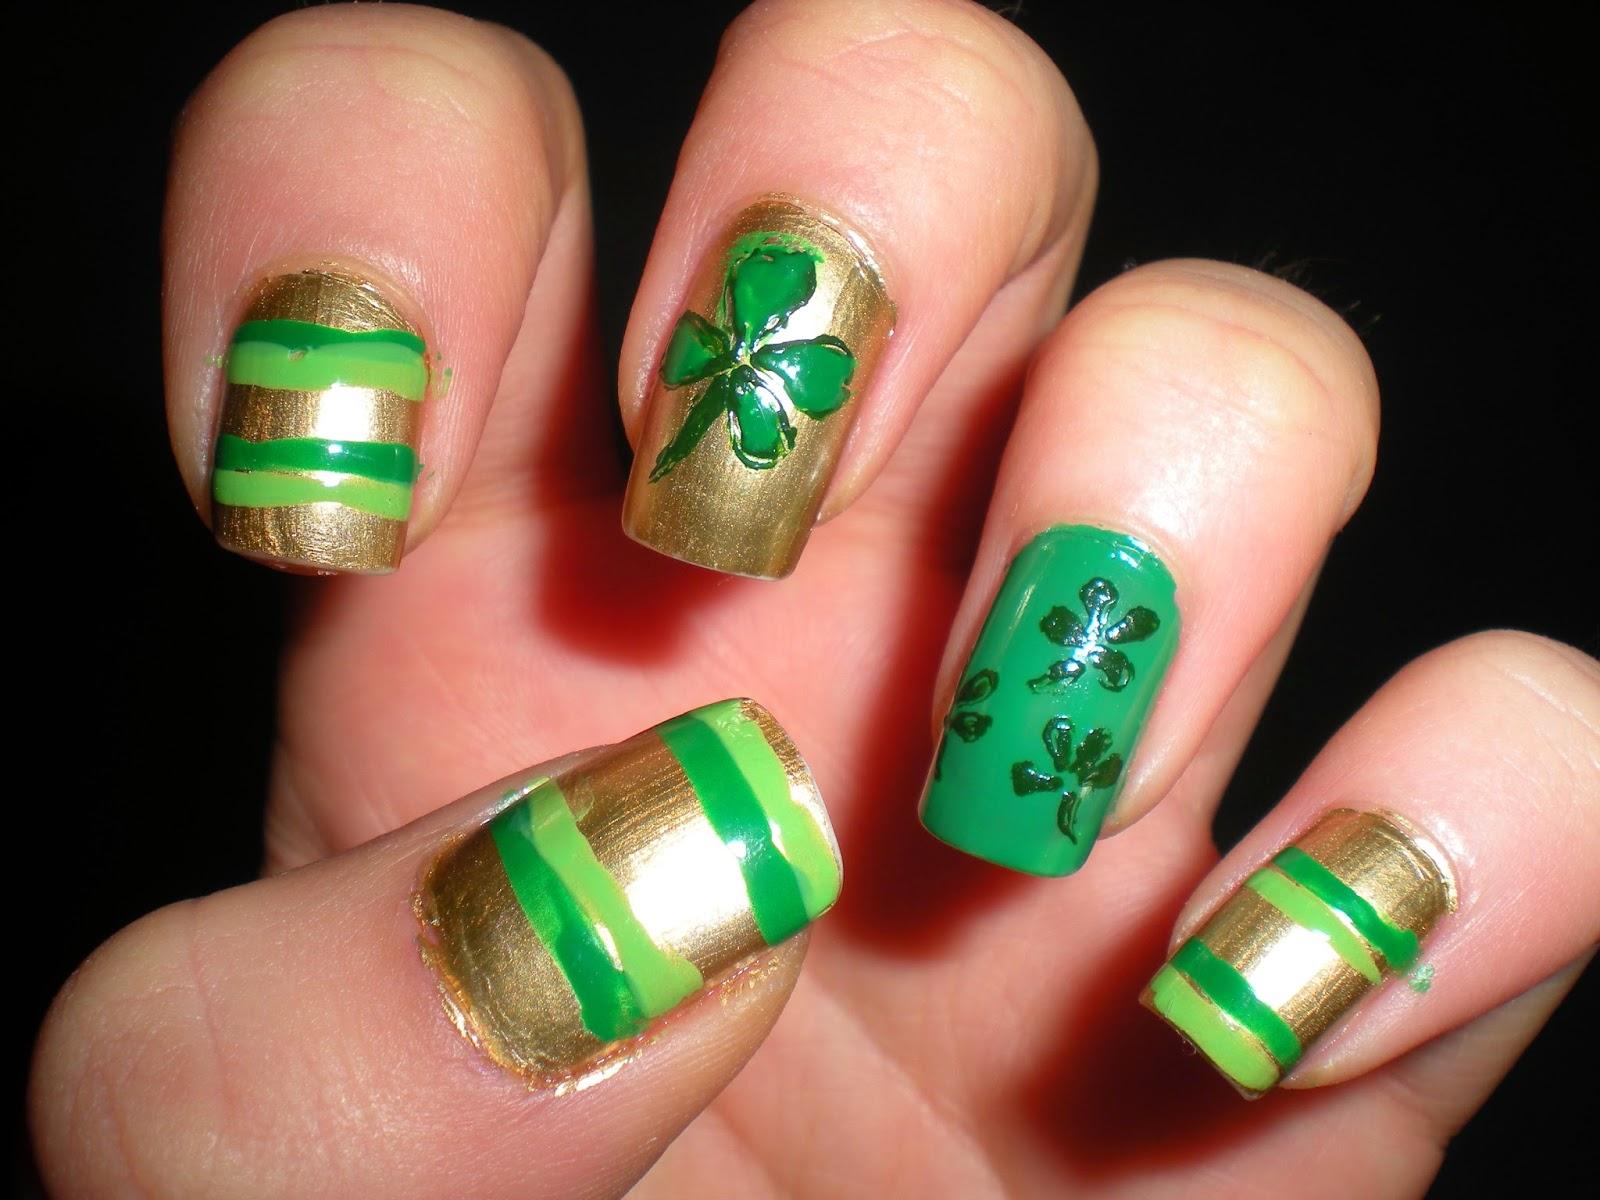 Metallic Maria: Lucky nails